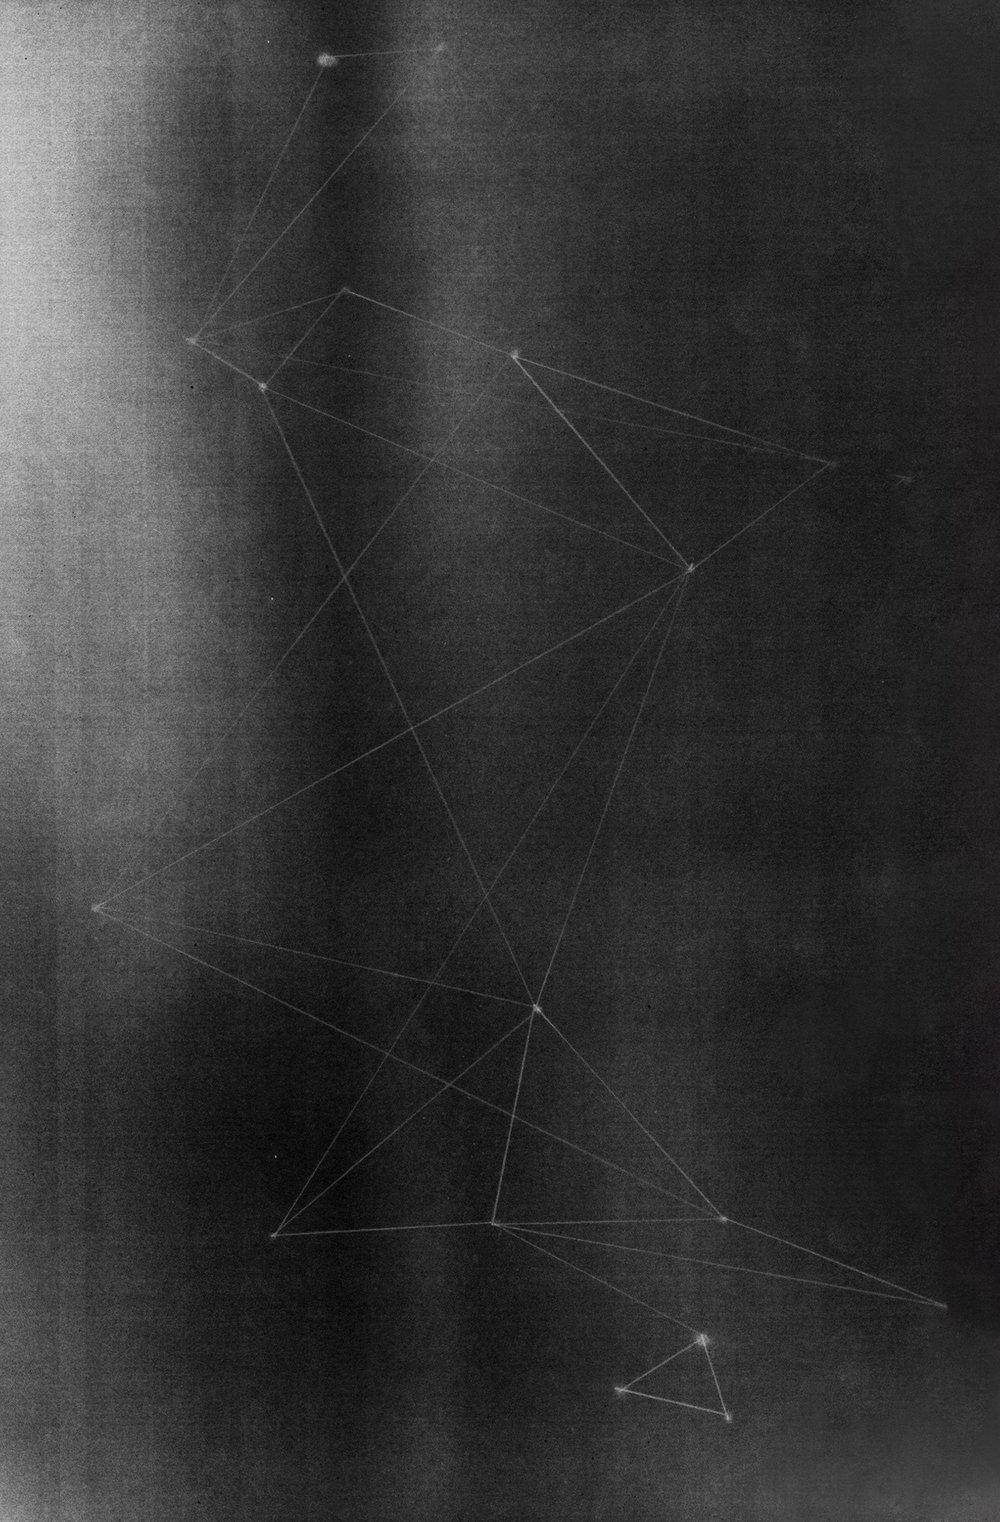 Constellations_AriadnaJunyent4.jpg